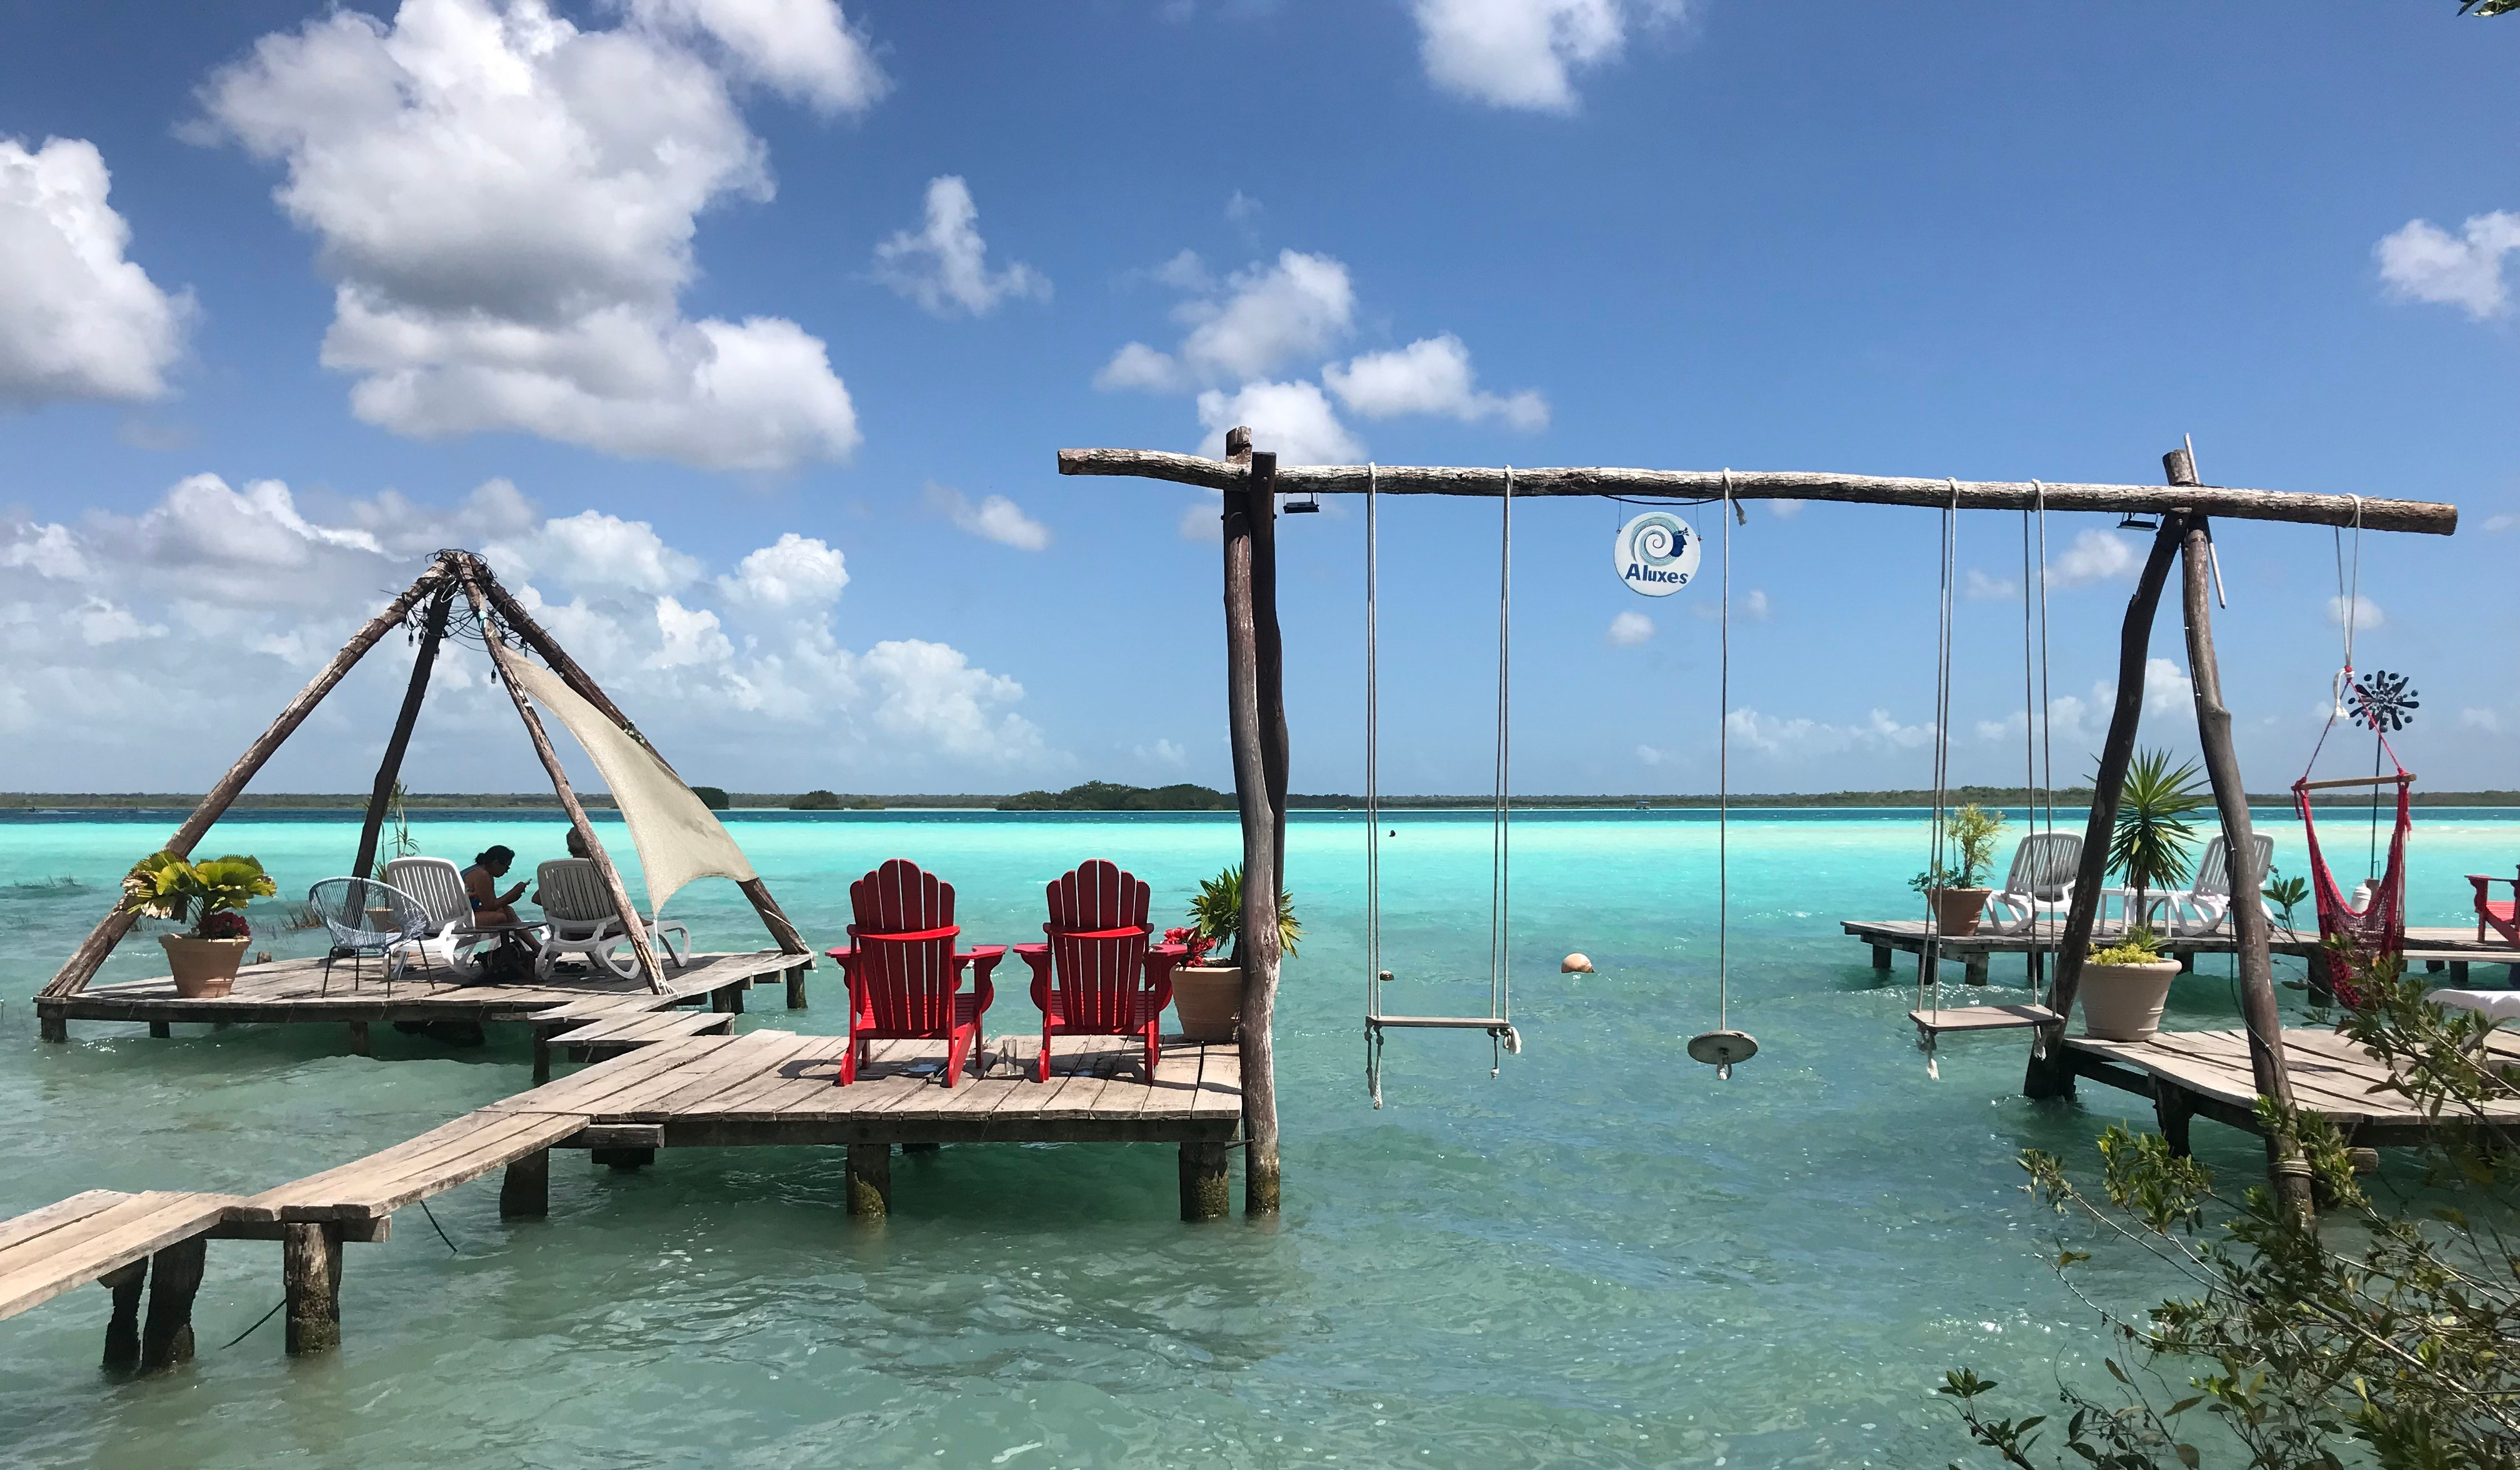 Que faire au Mexique ? - La lagune de Bacalar © Clara Casciana